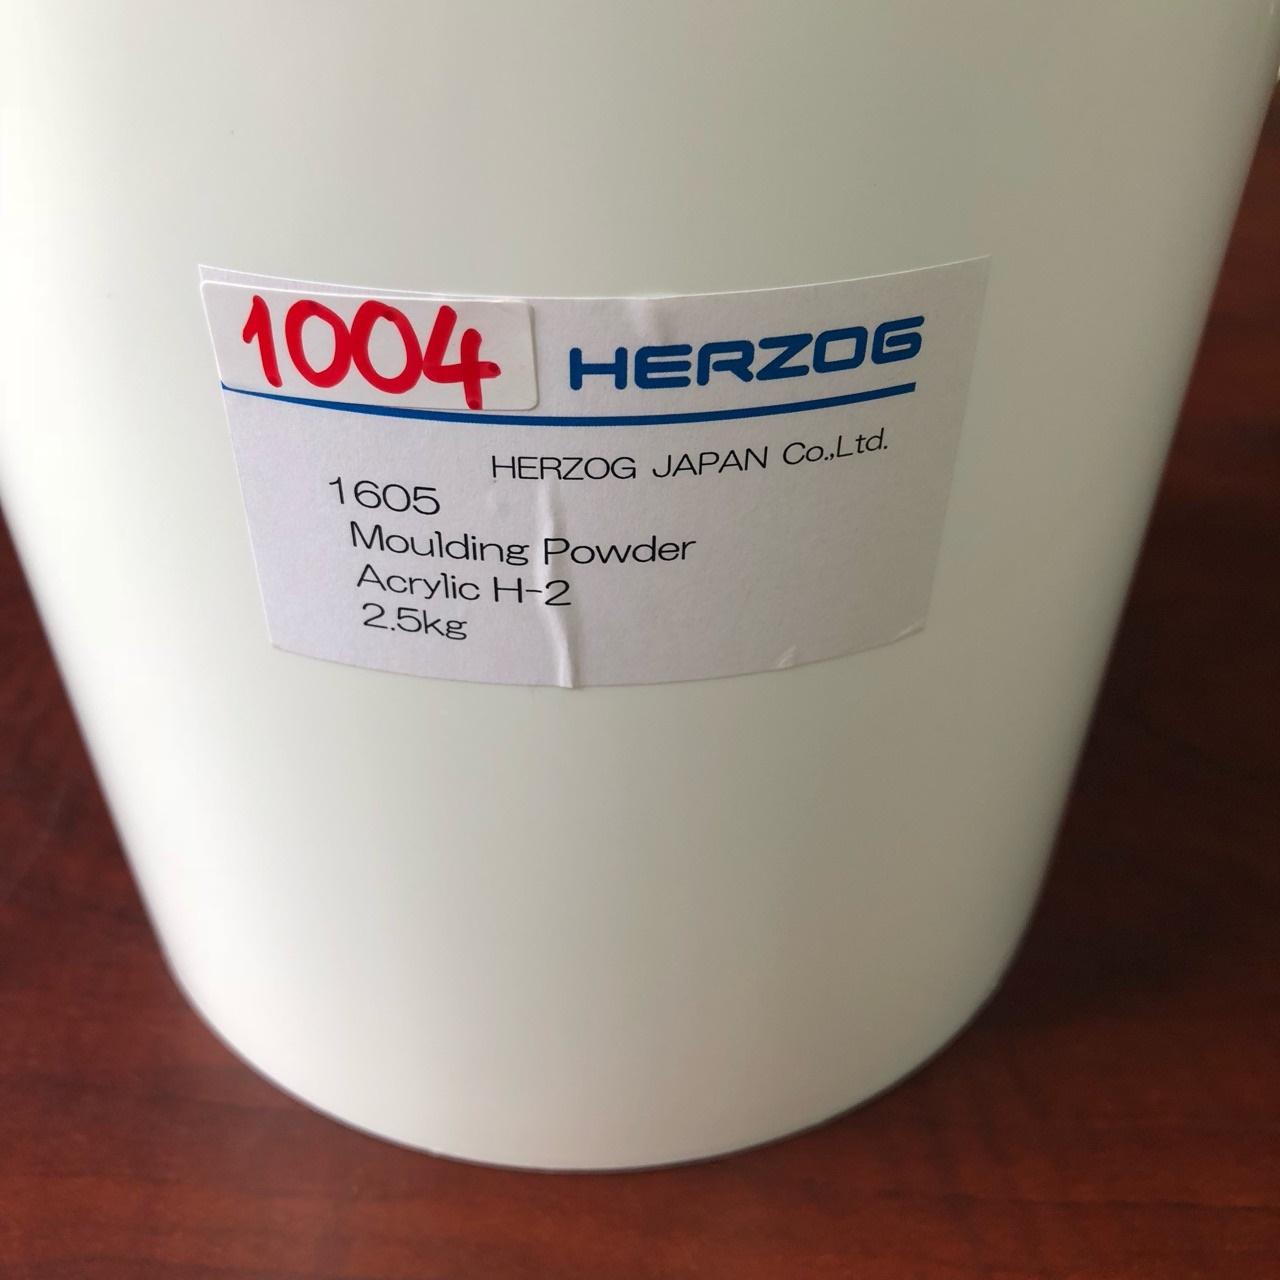 ACRYLIC H-2 1605 Herzog